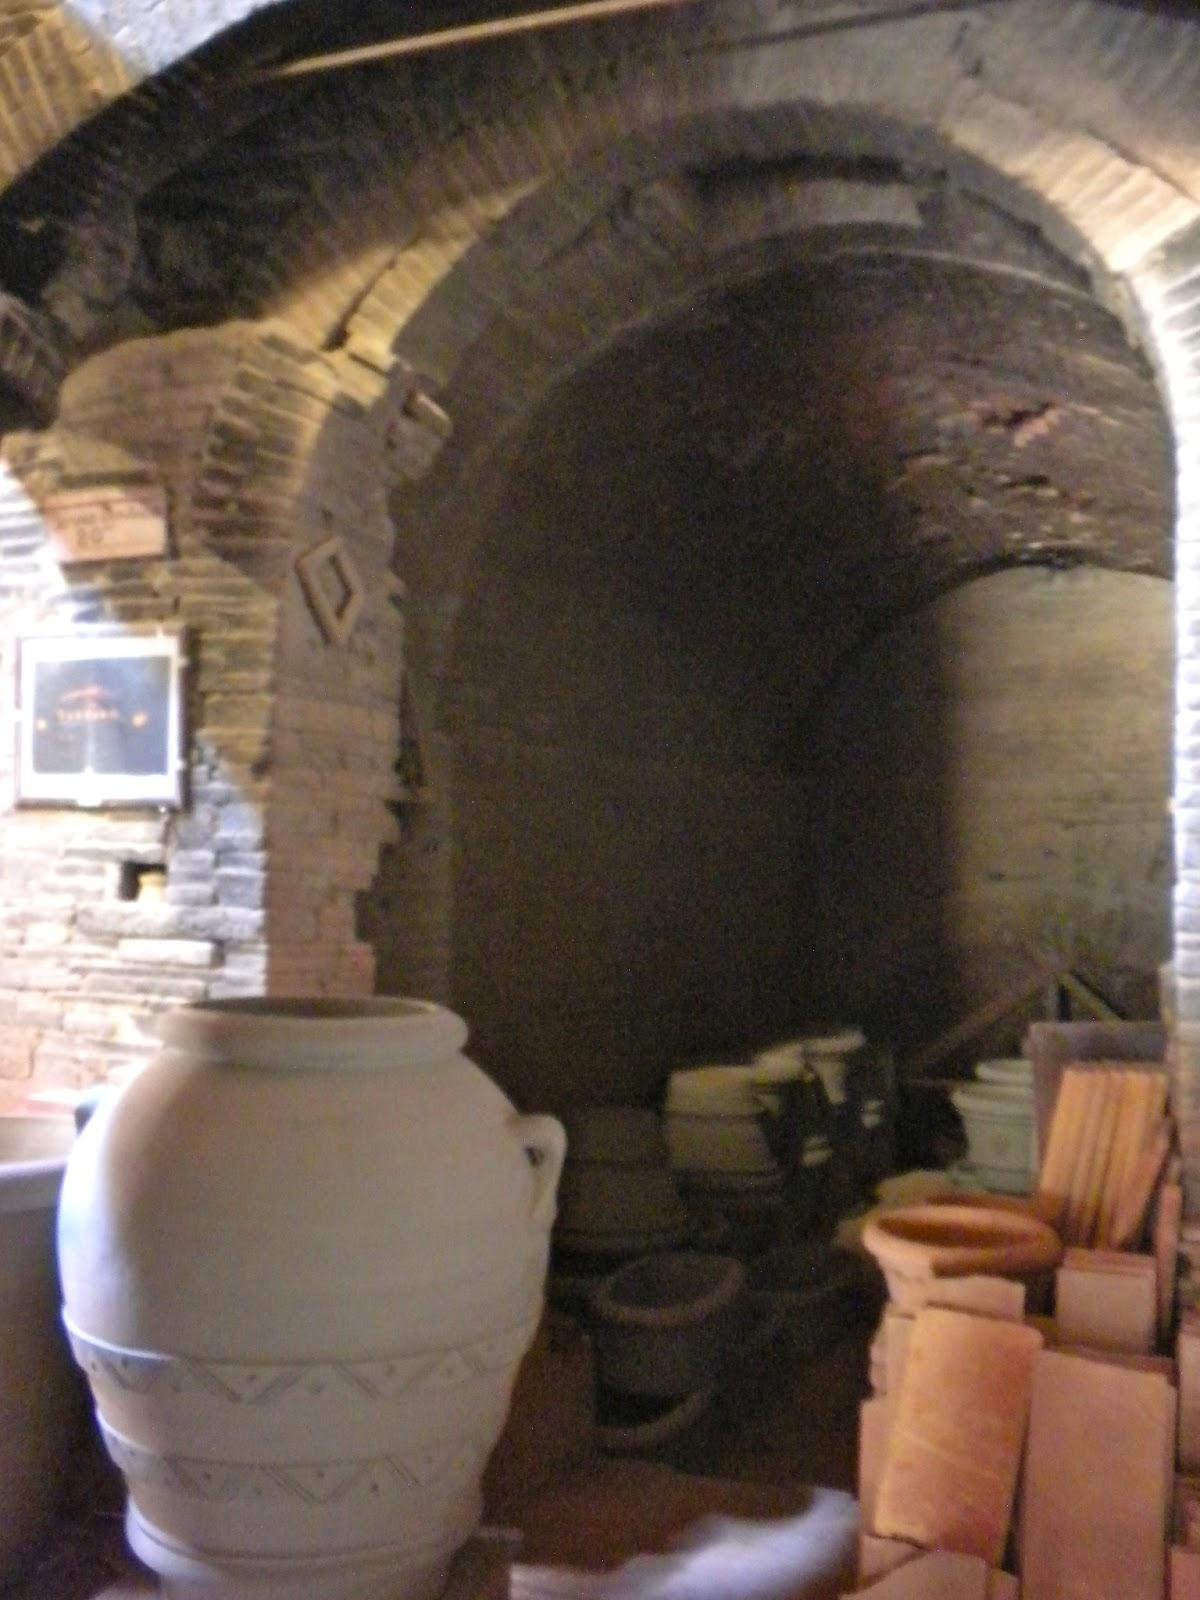 From a tuscan hillside the terracotta potteries of for Masini terrecotte impruneta